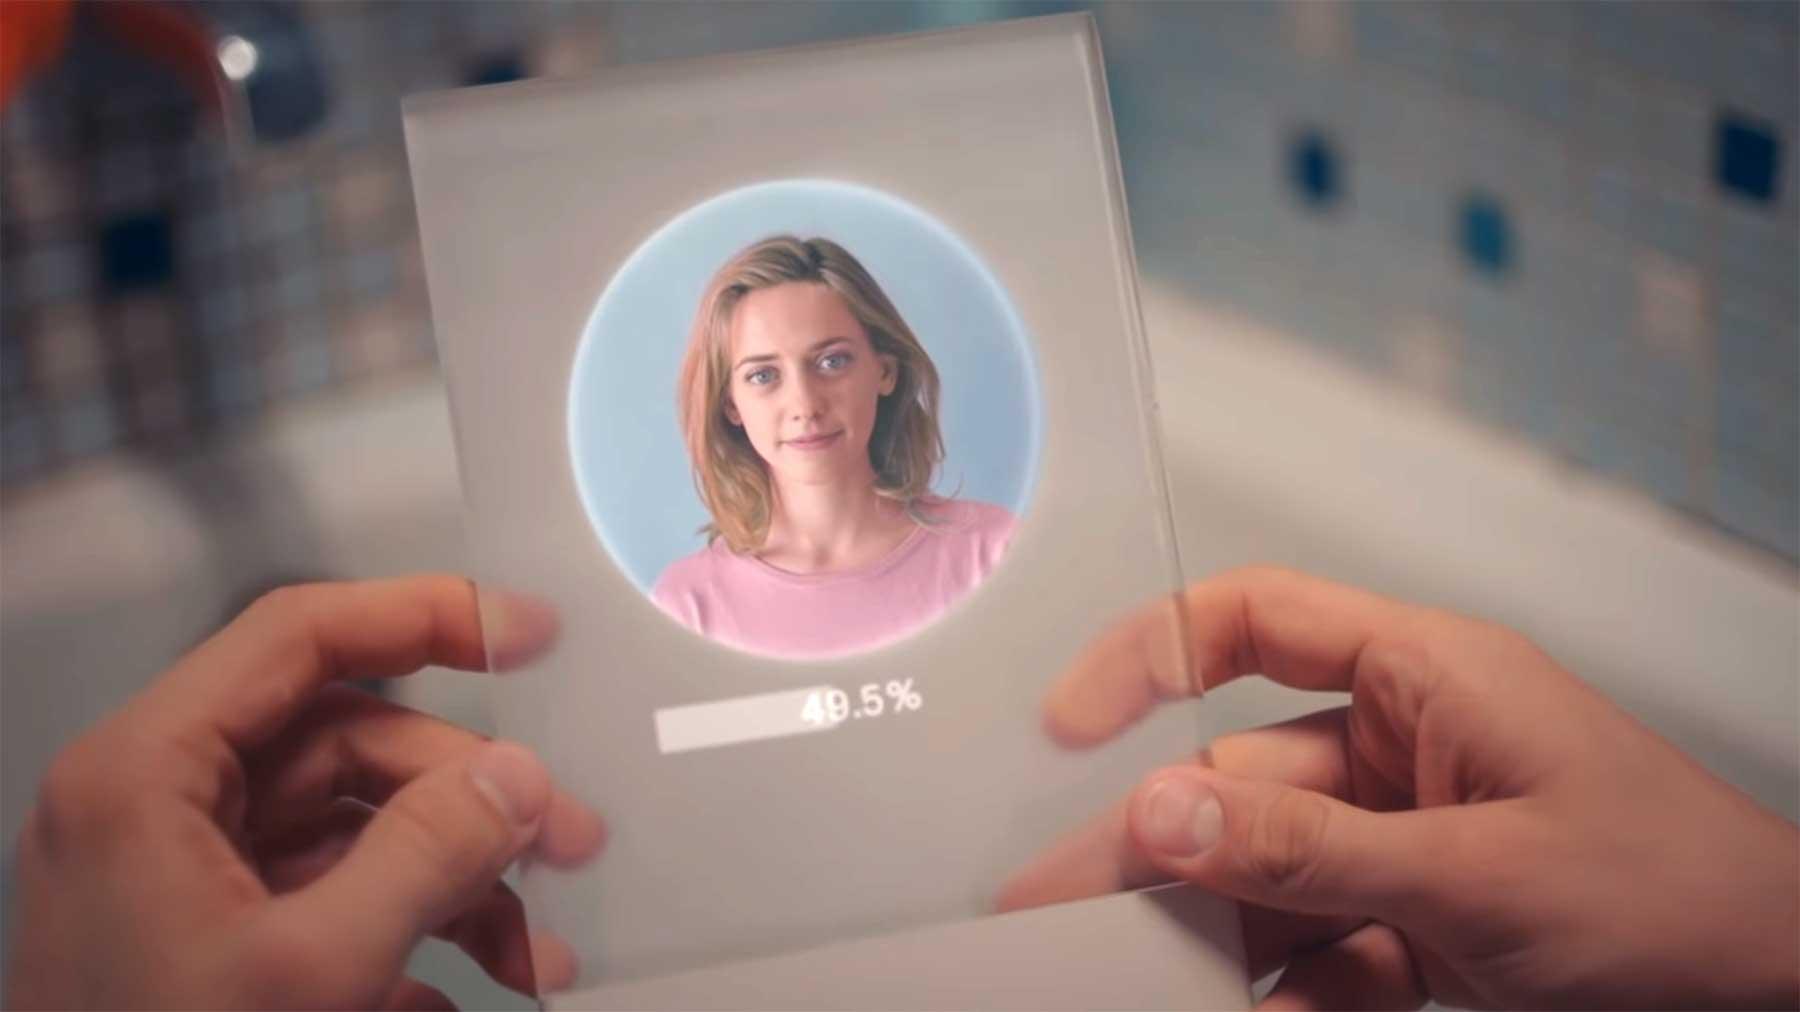 Suche nach dem perfektem Partner per App kurzfilm-storm